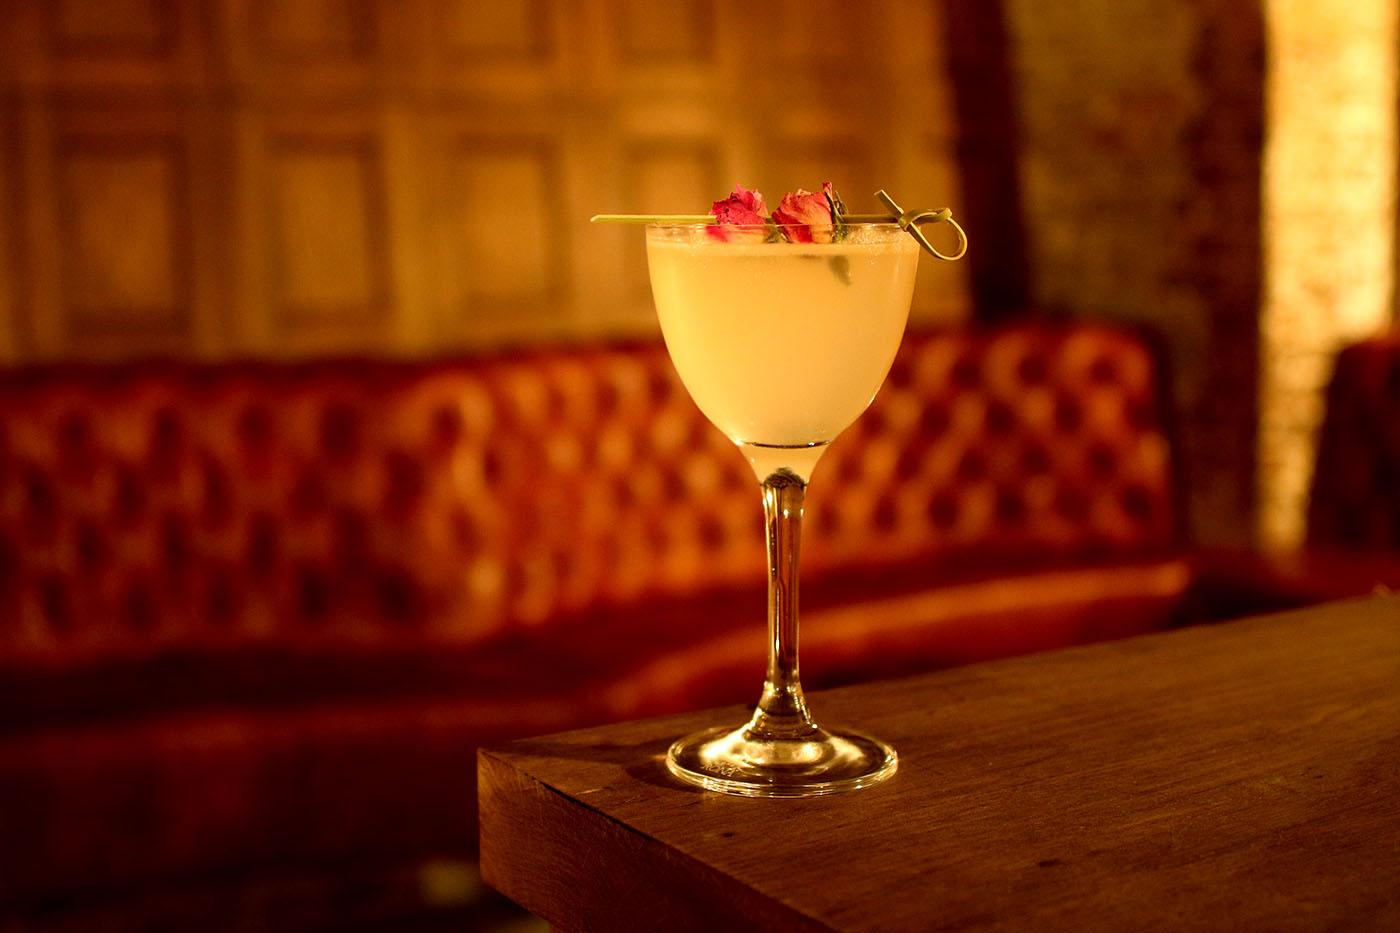 tt-liquor-cellar-cocktail-bar-shoreditch-east-london-11-cocktail-journeys